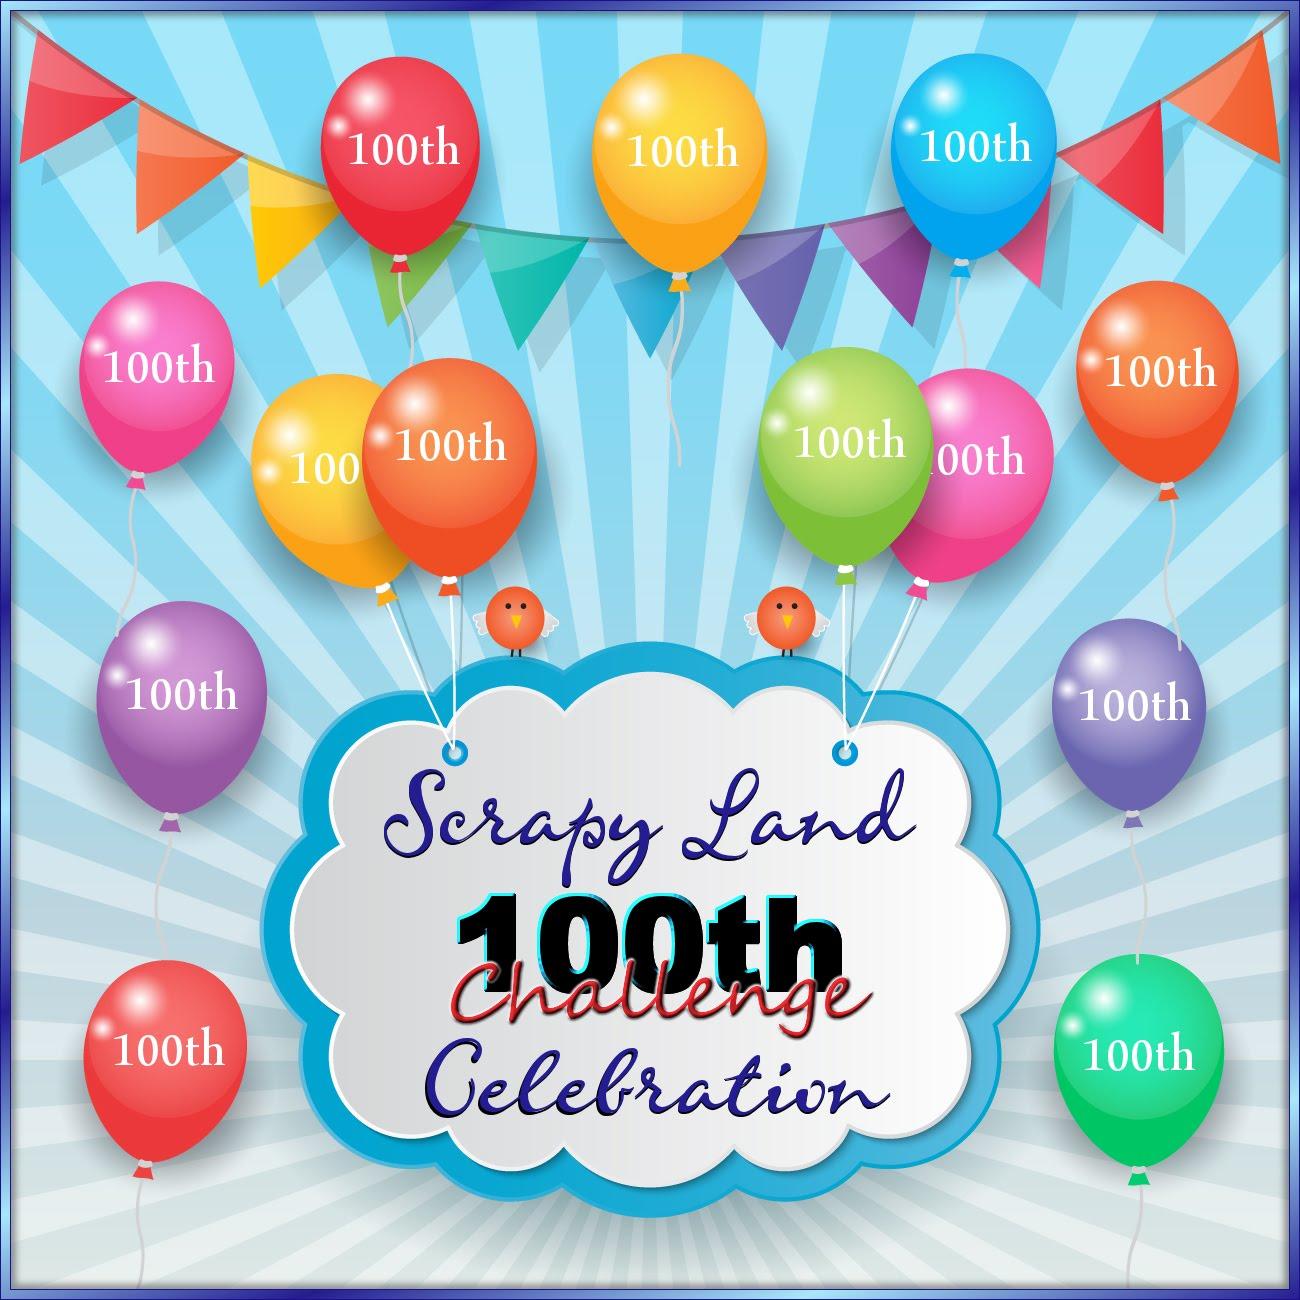 Scrapy Land 100th Challenge Celebrations